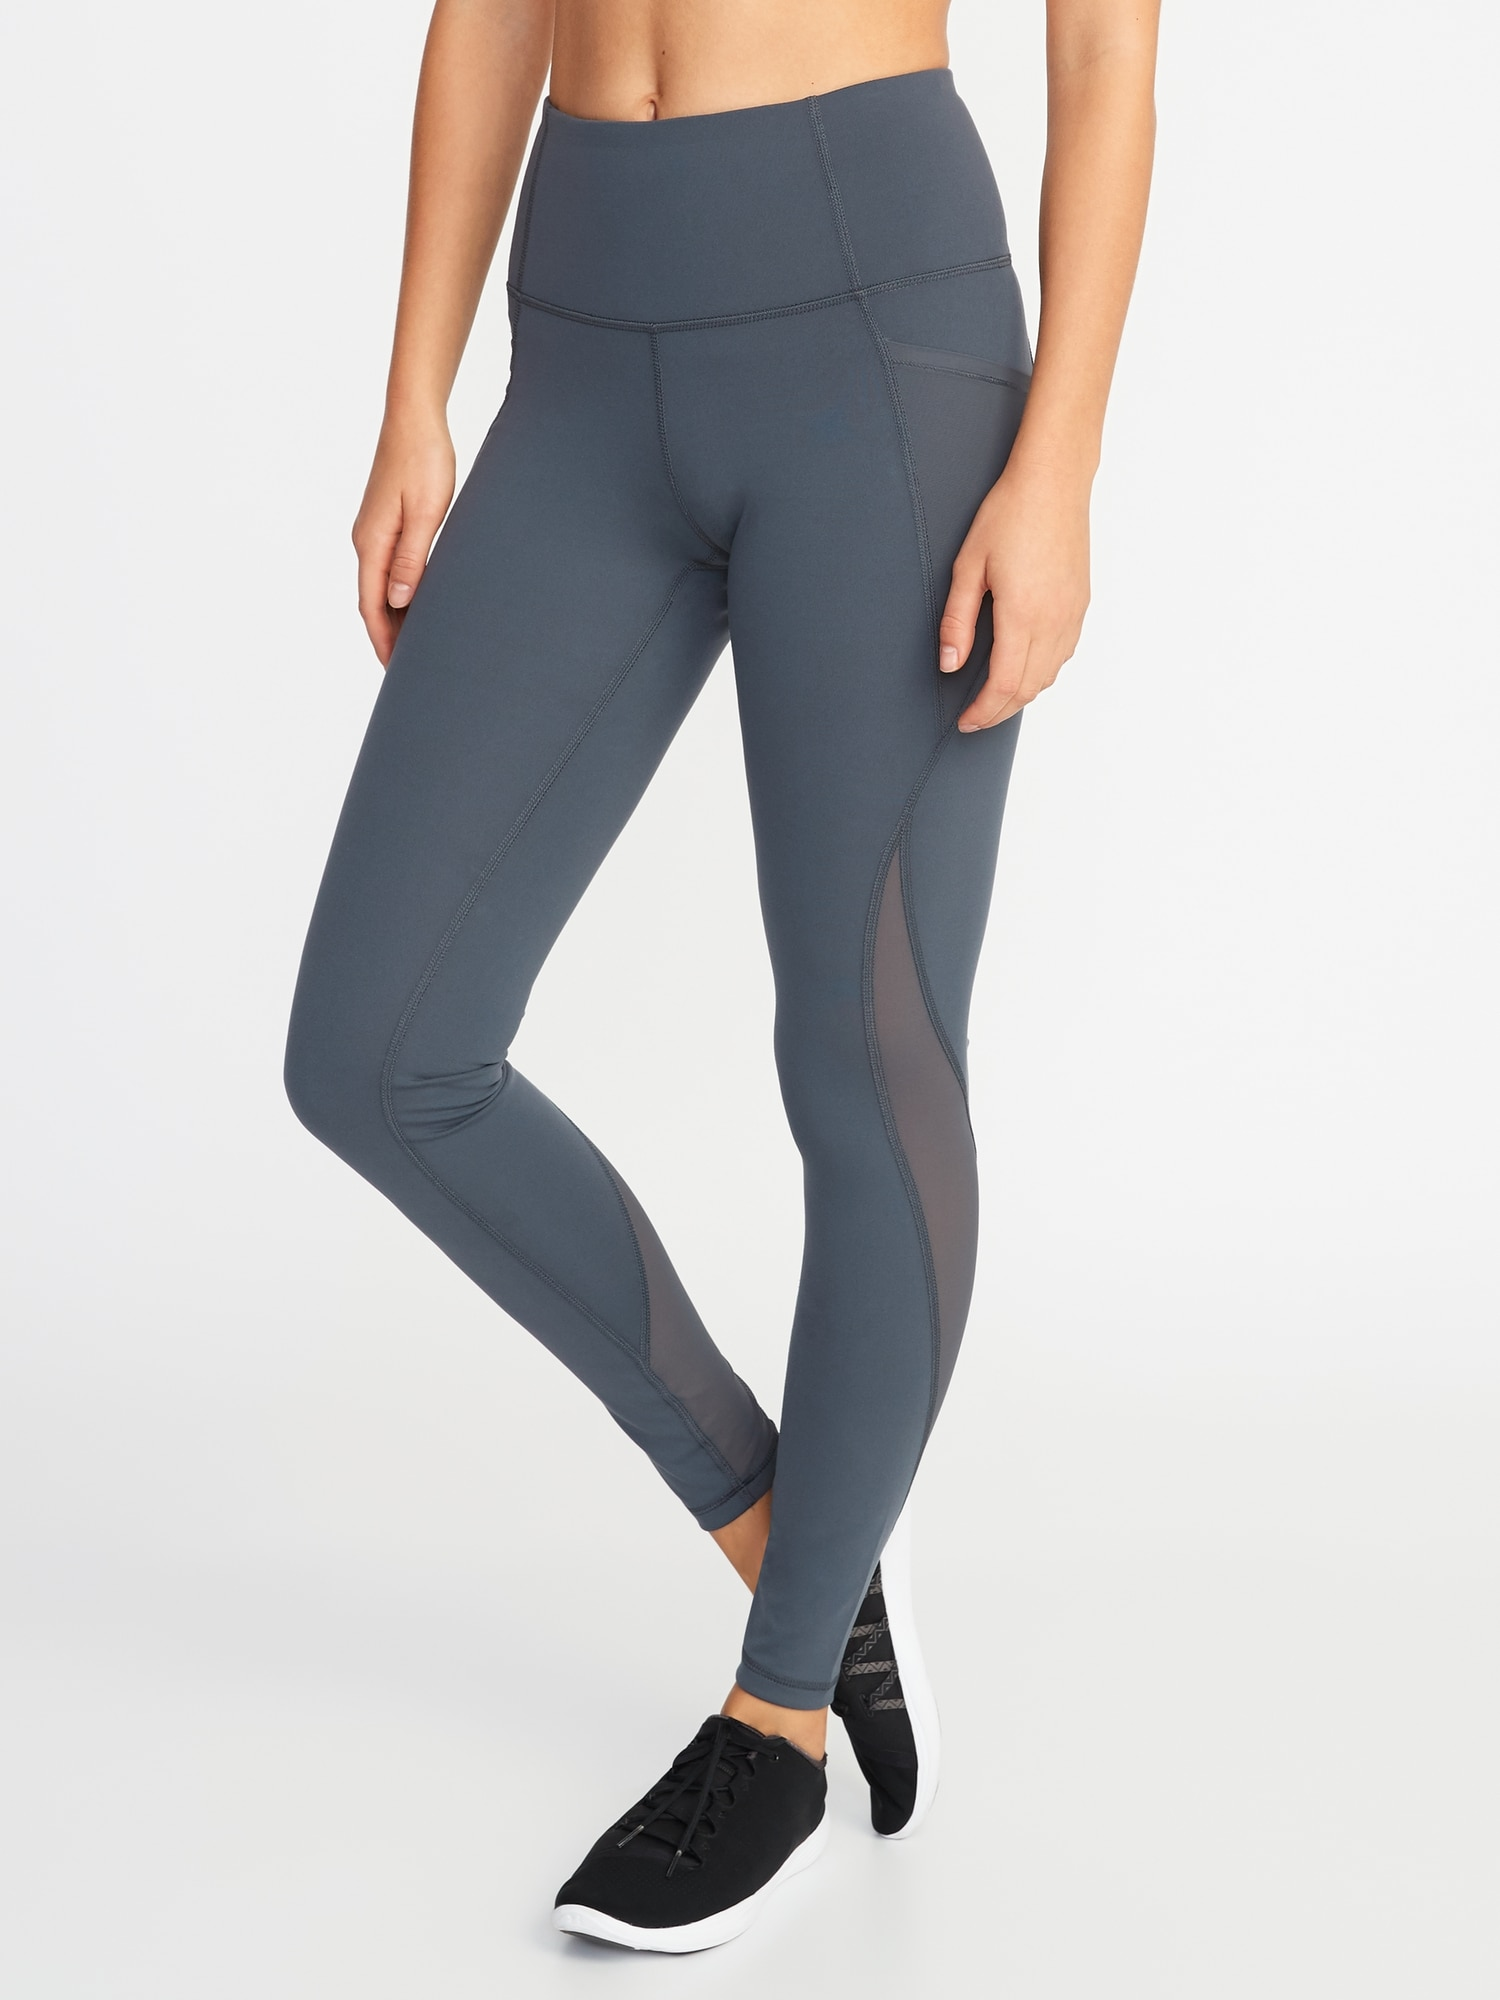 c82877c949f0 High-Rise Elevate Side-Pocket Mesh-Trim Compression Leggings for Women